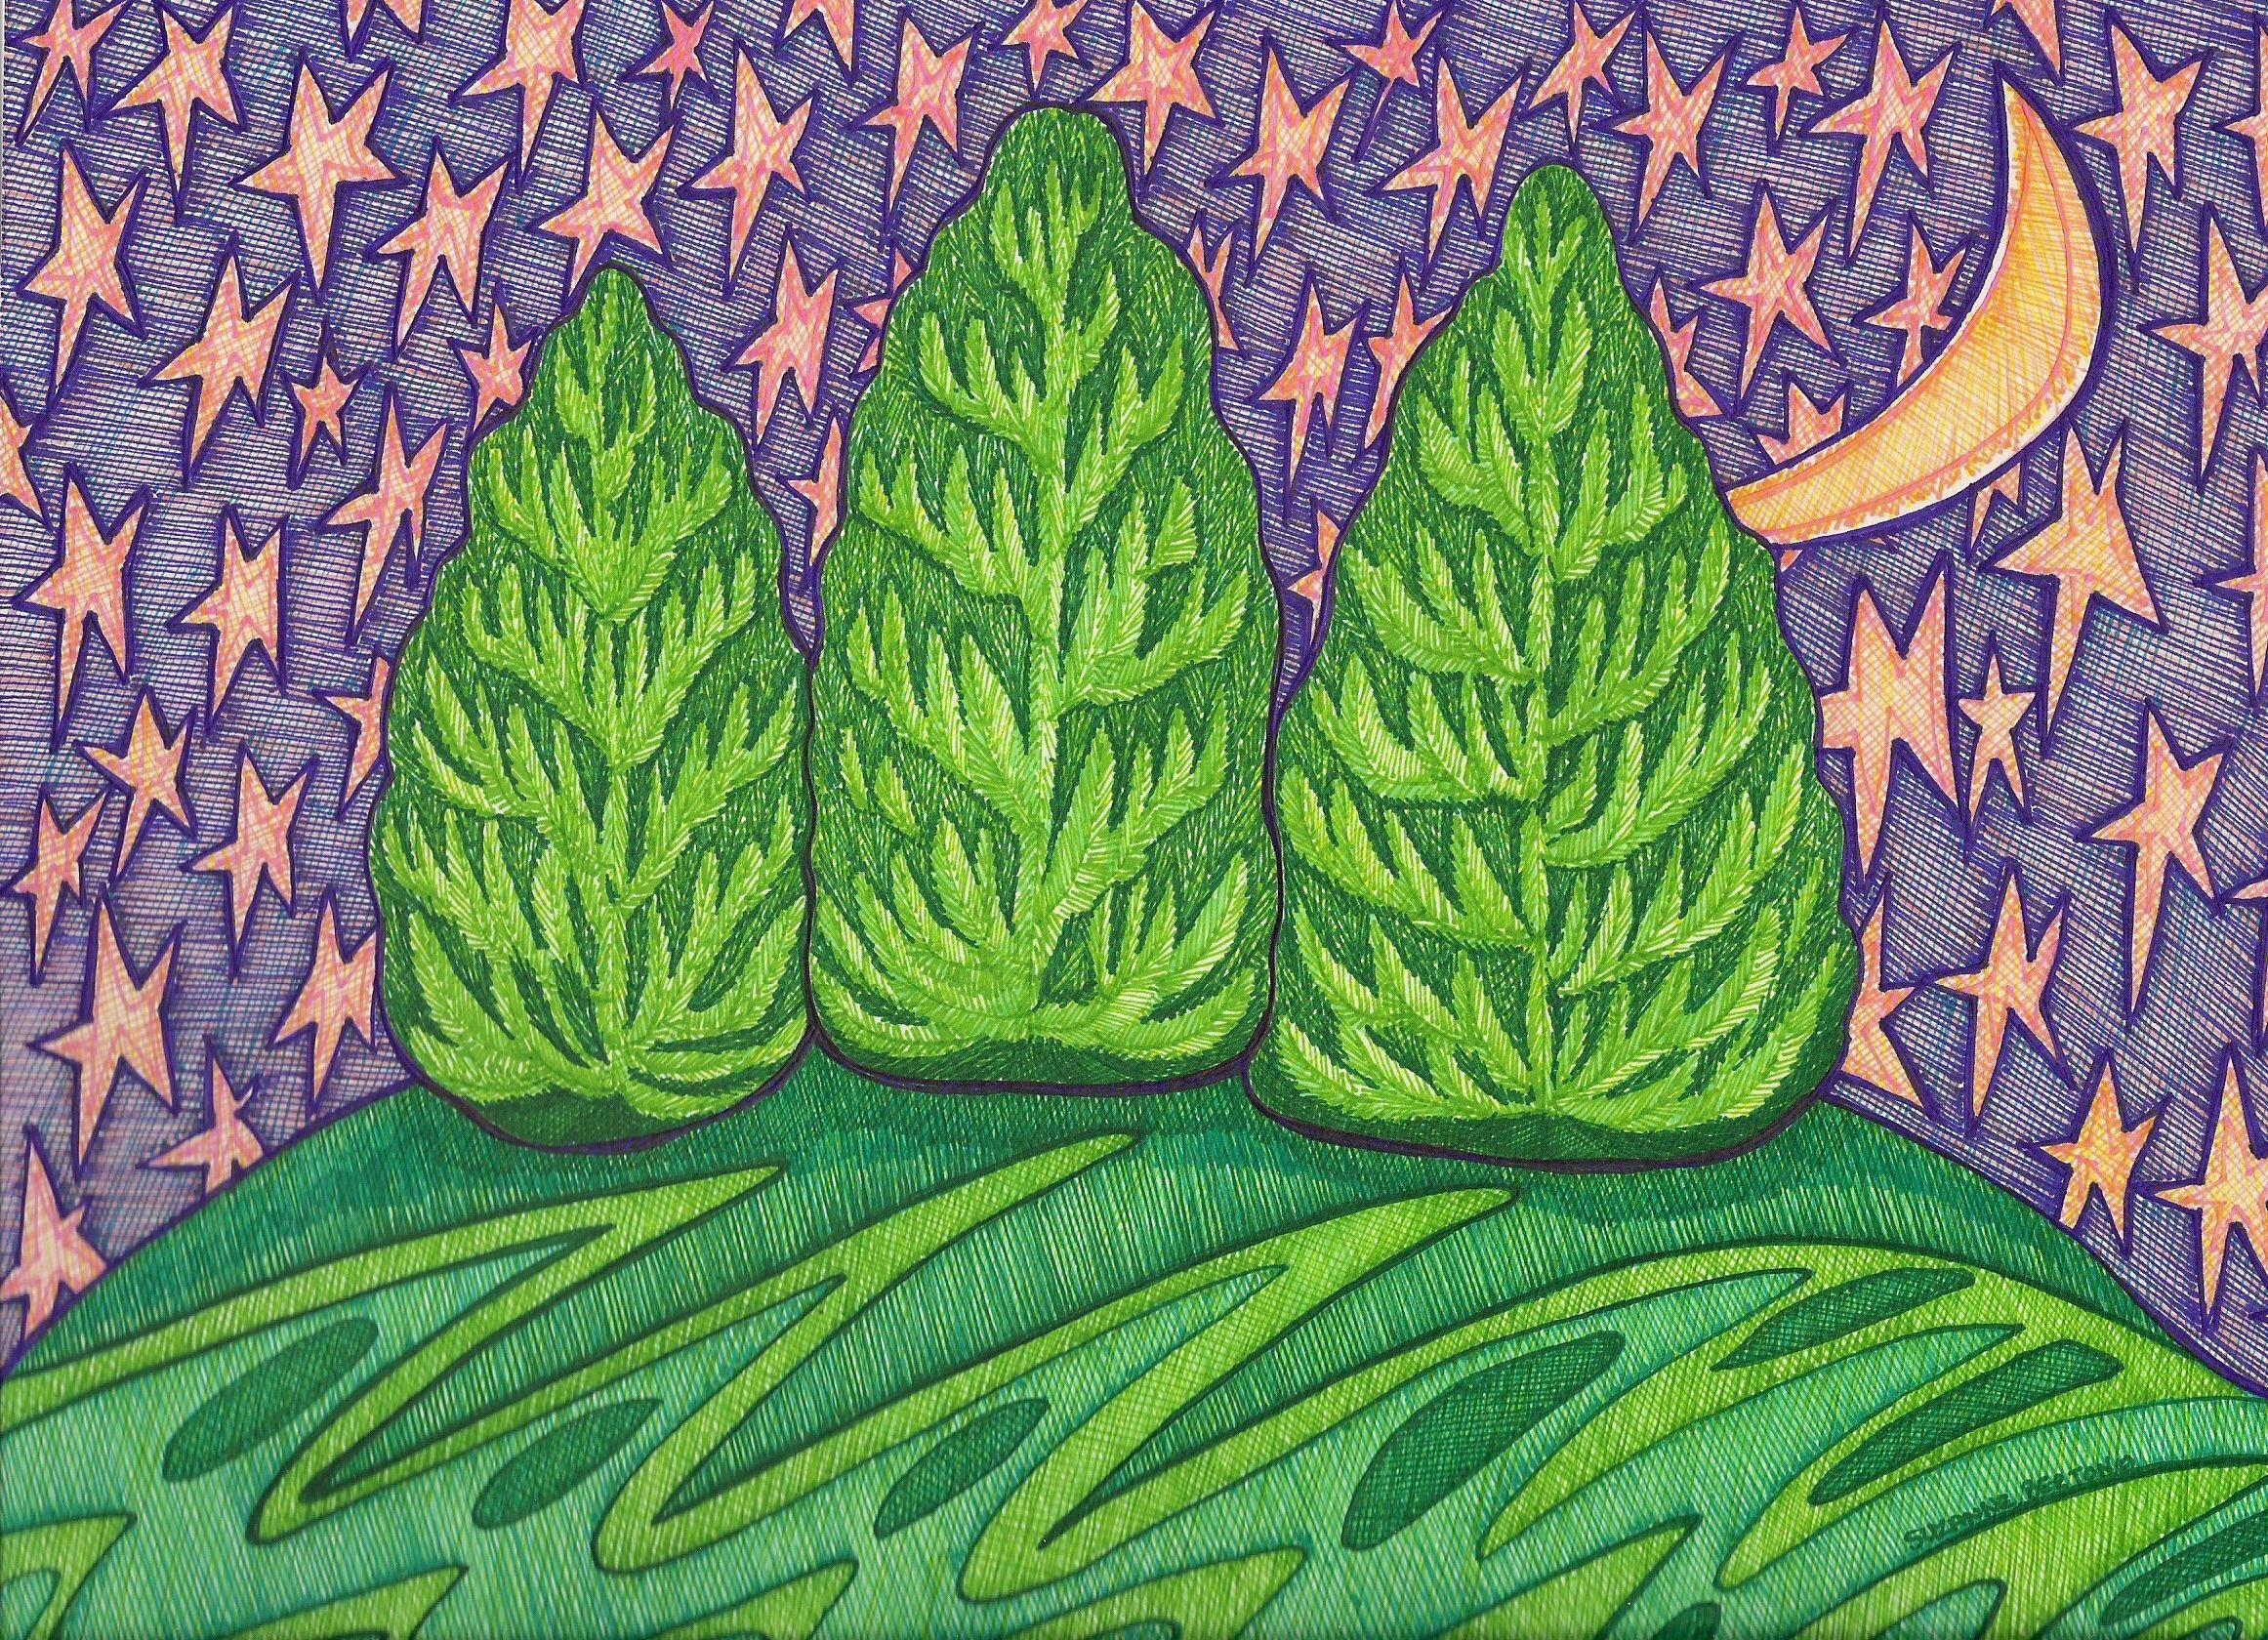 Evergreen ~ Stylized version by Suzanne Berton